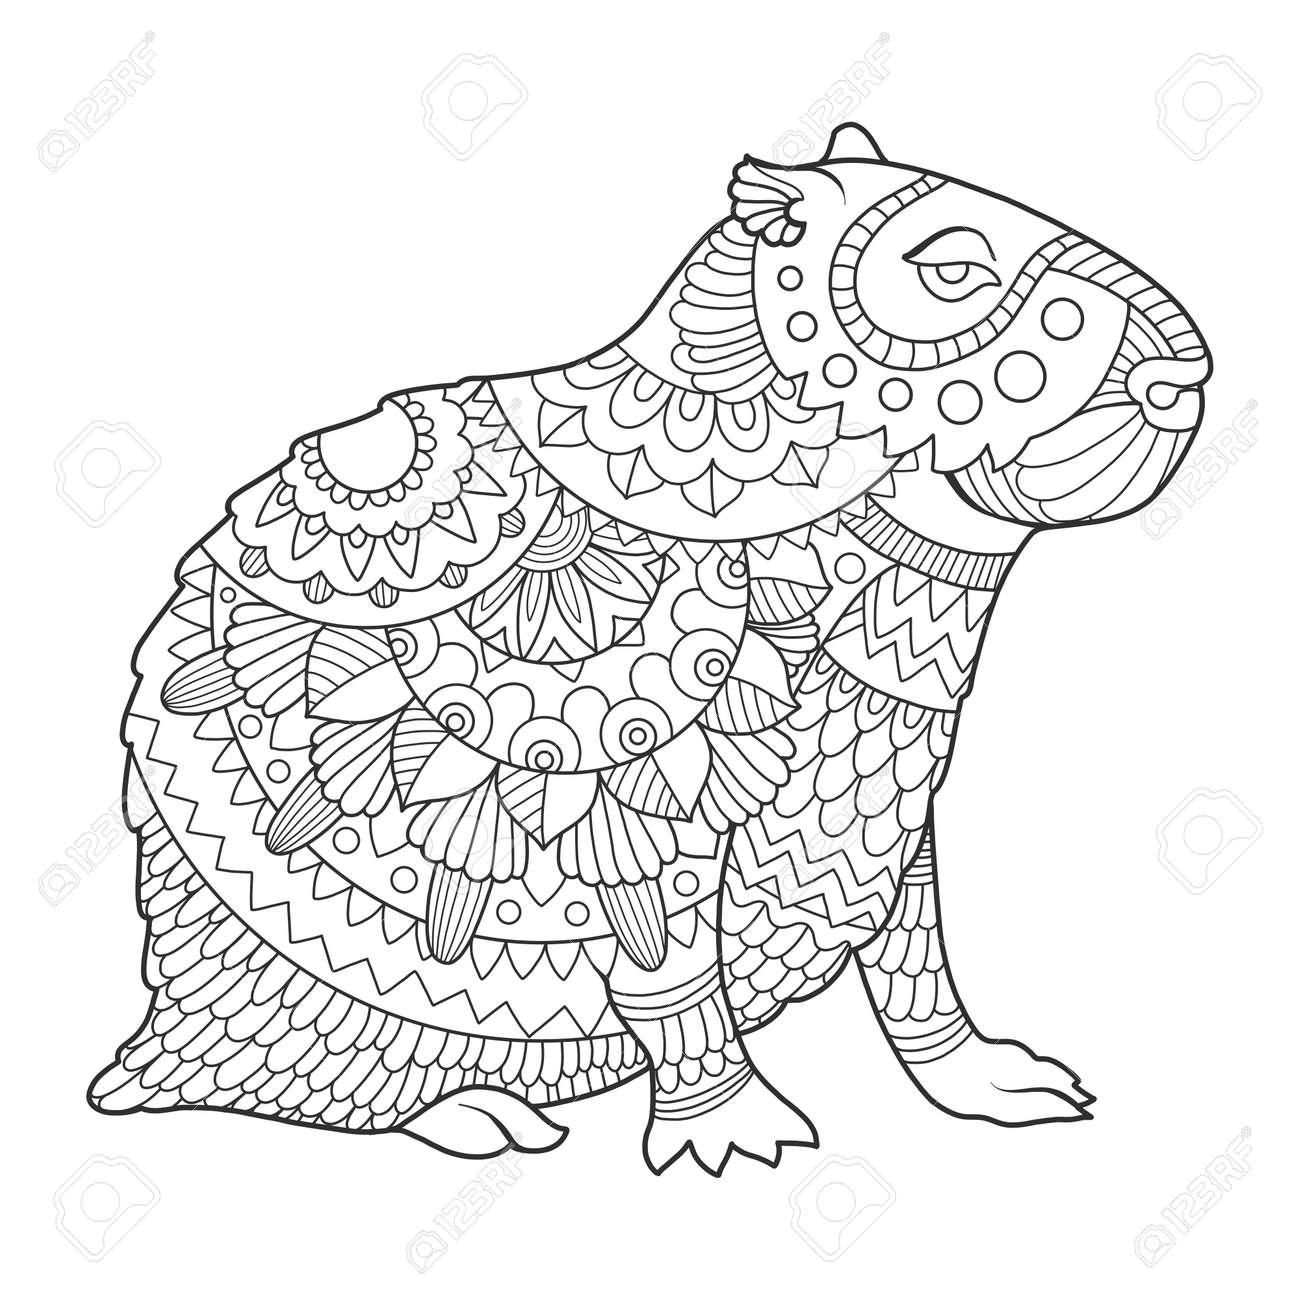 Capybara Rodent Animal Coloring Book Vector Illustration. Black ...